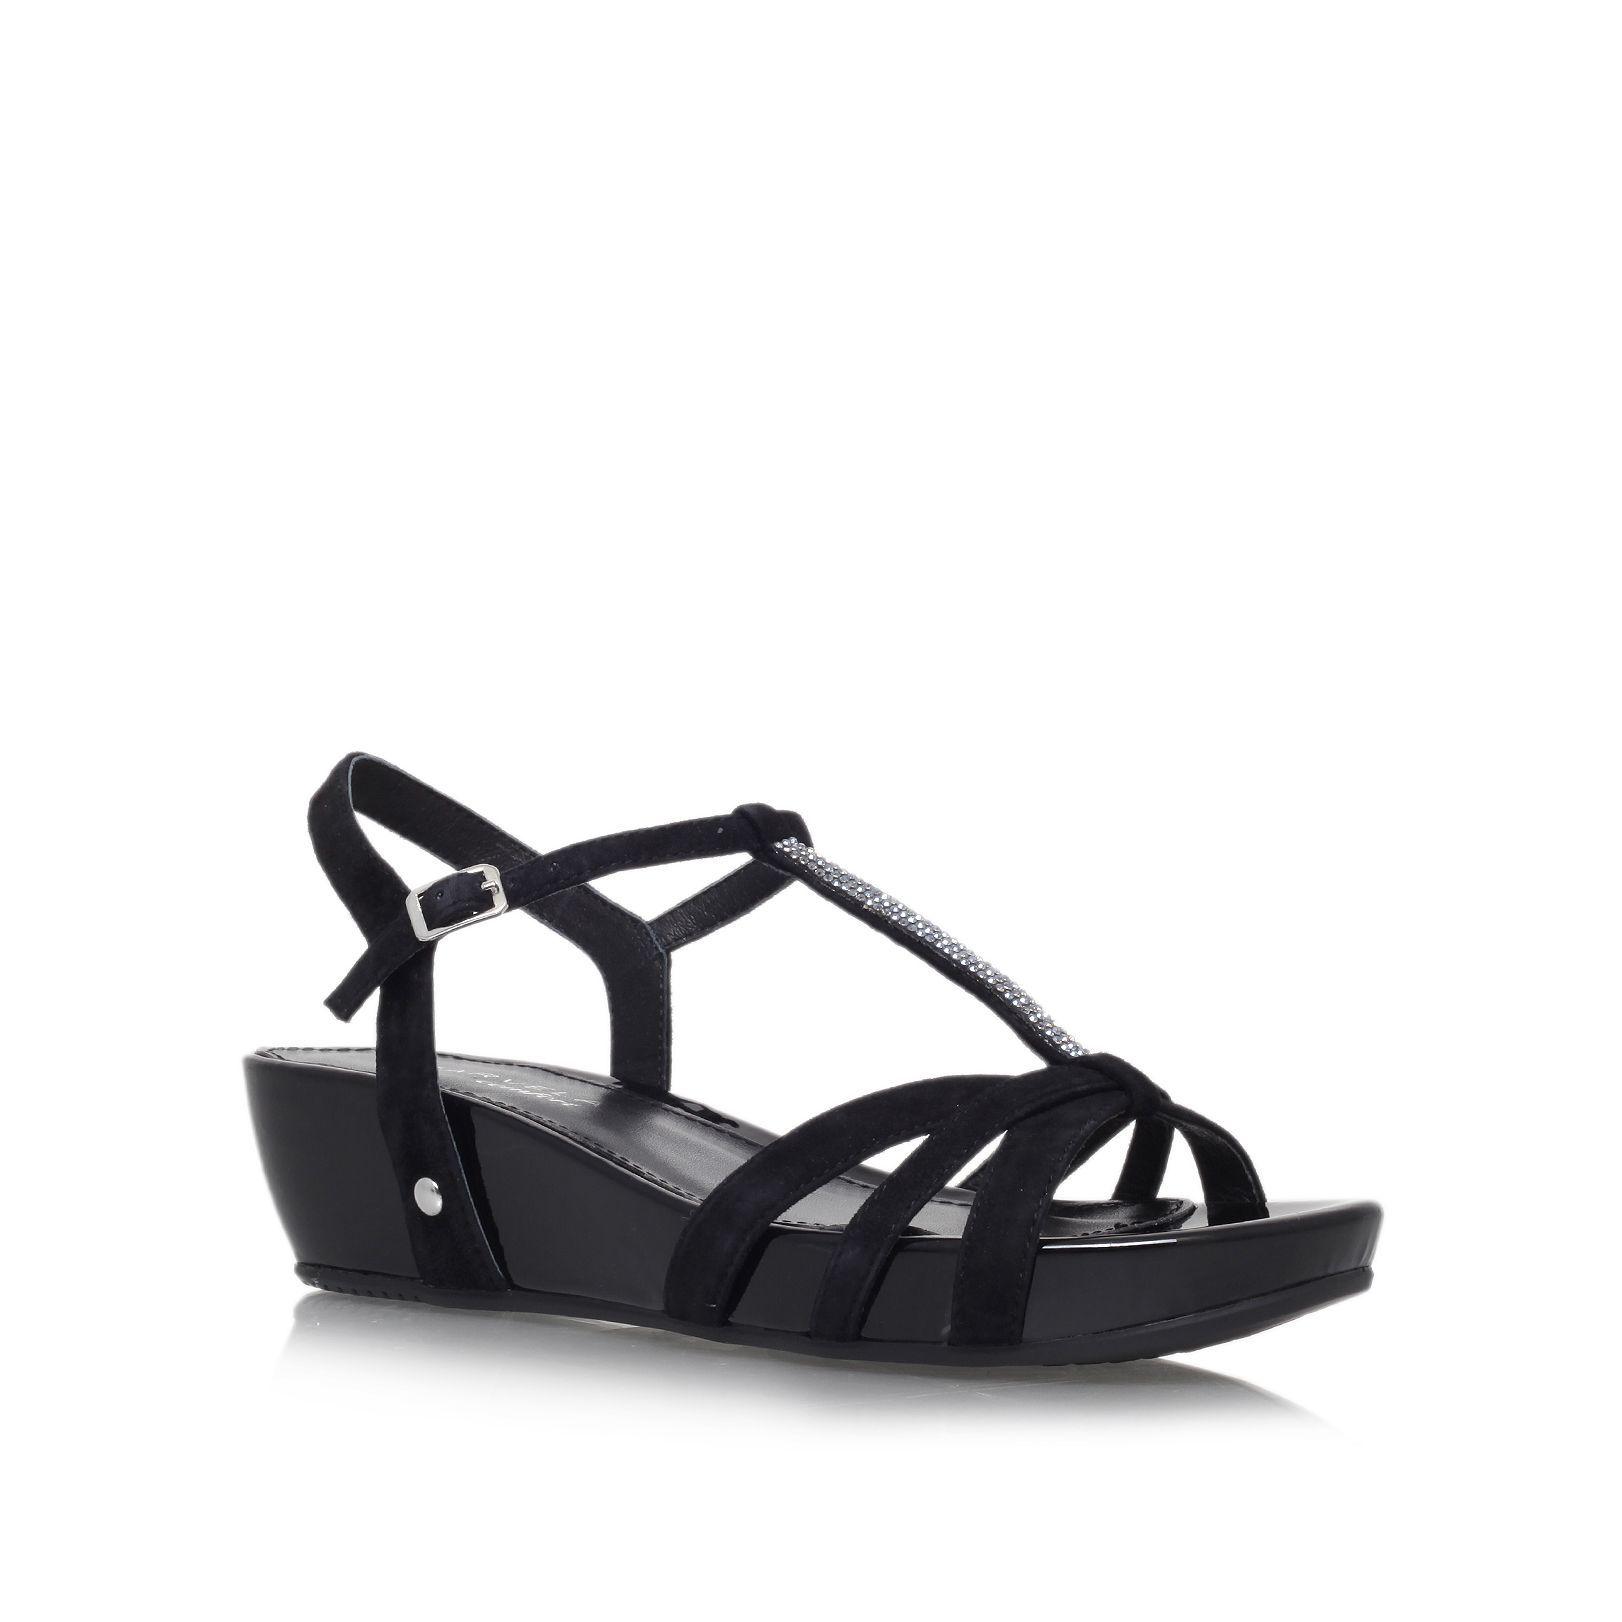 Carvela Solar low wedge heel sandals, Black